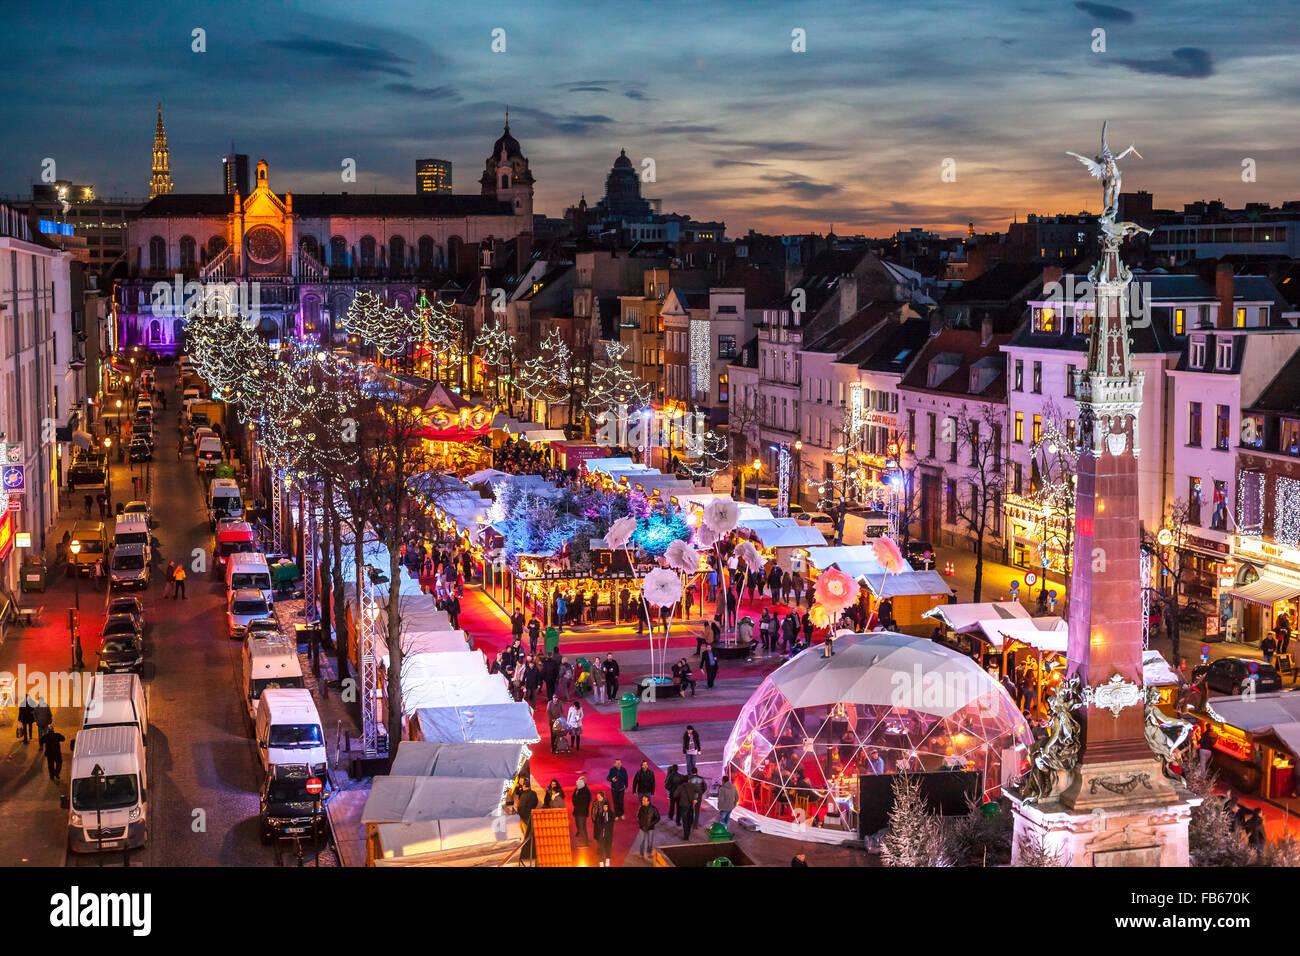 http://c7.alamy.com/comp/FB670K/belgium-brussels-christmas-market-or-winter-wonders-march-aux-poissons-FB670K.jpg